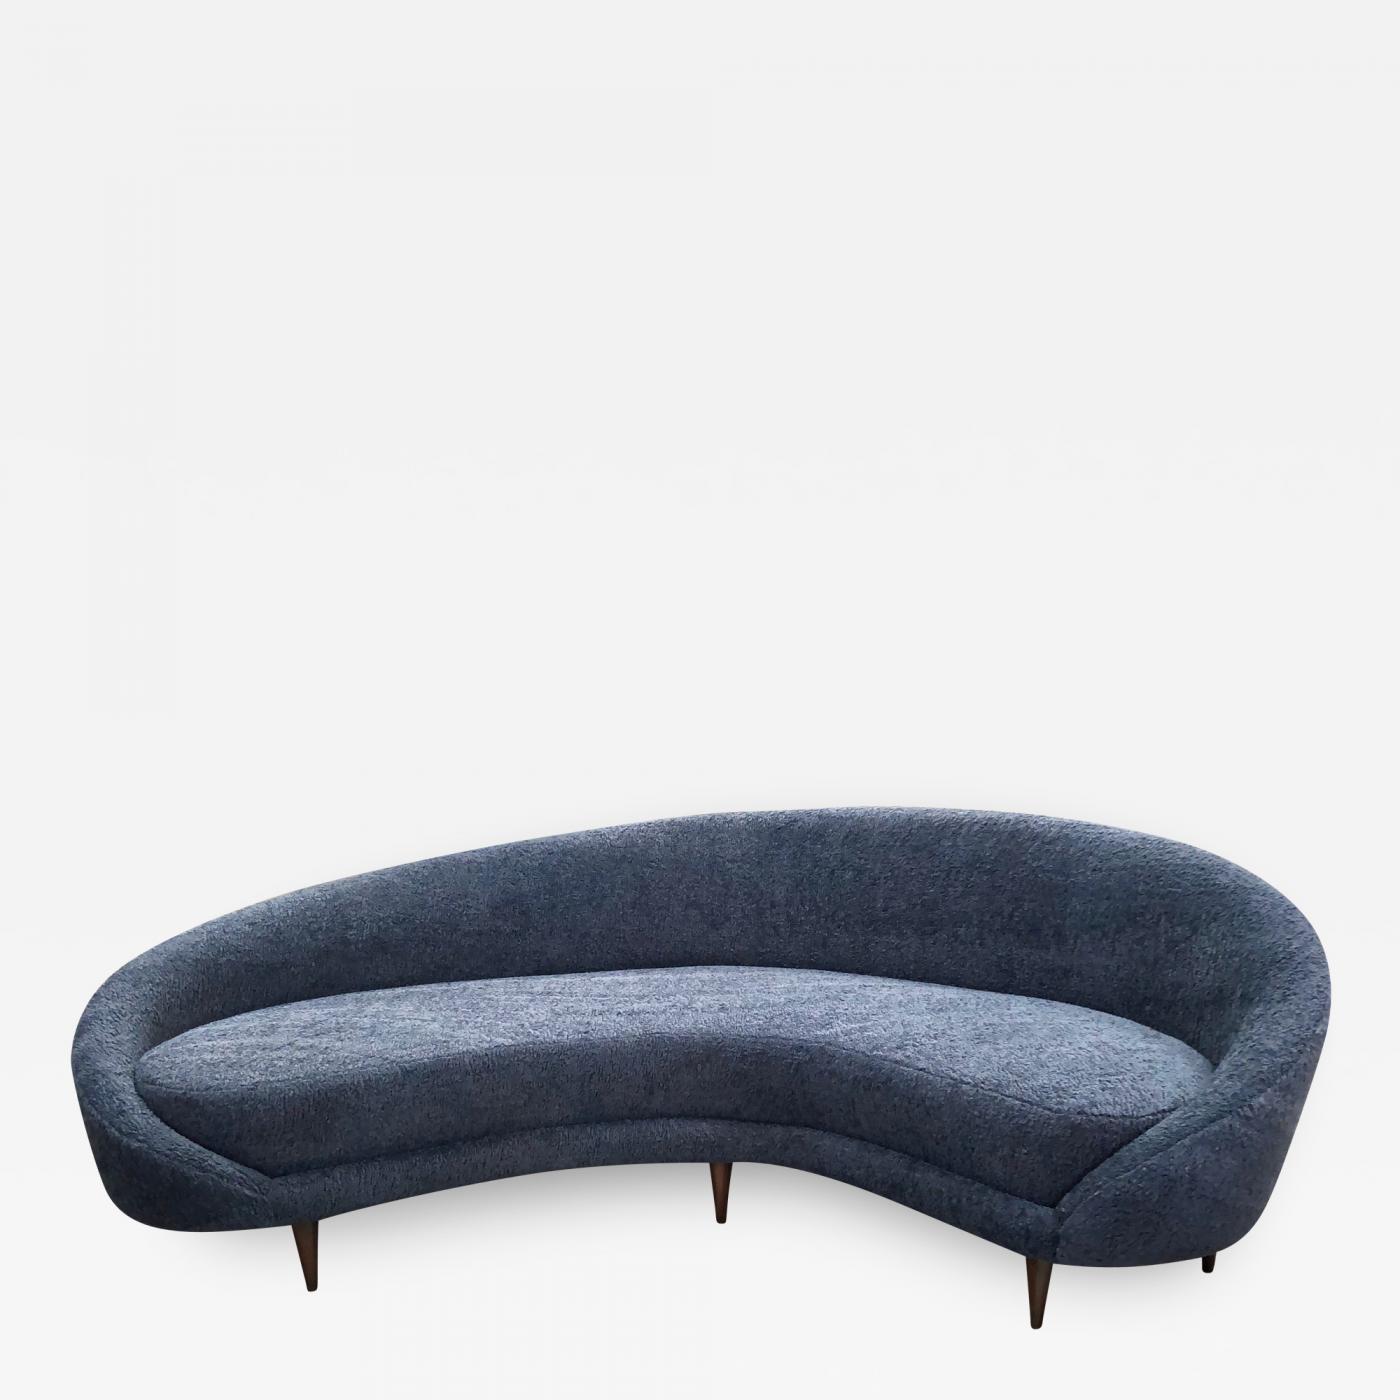 Federico Munari - Federico Munari Mid-Century Italian large curved sofa,  1950s - Re-Upholstery